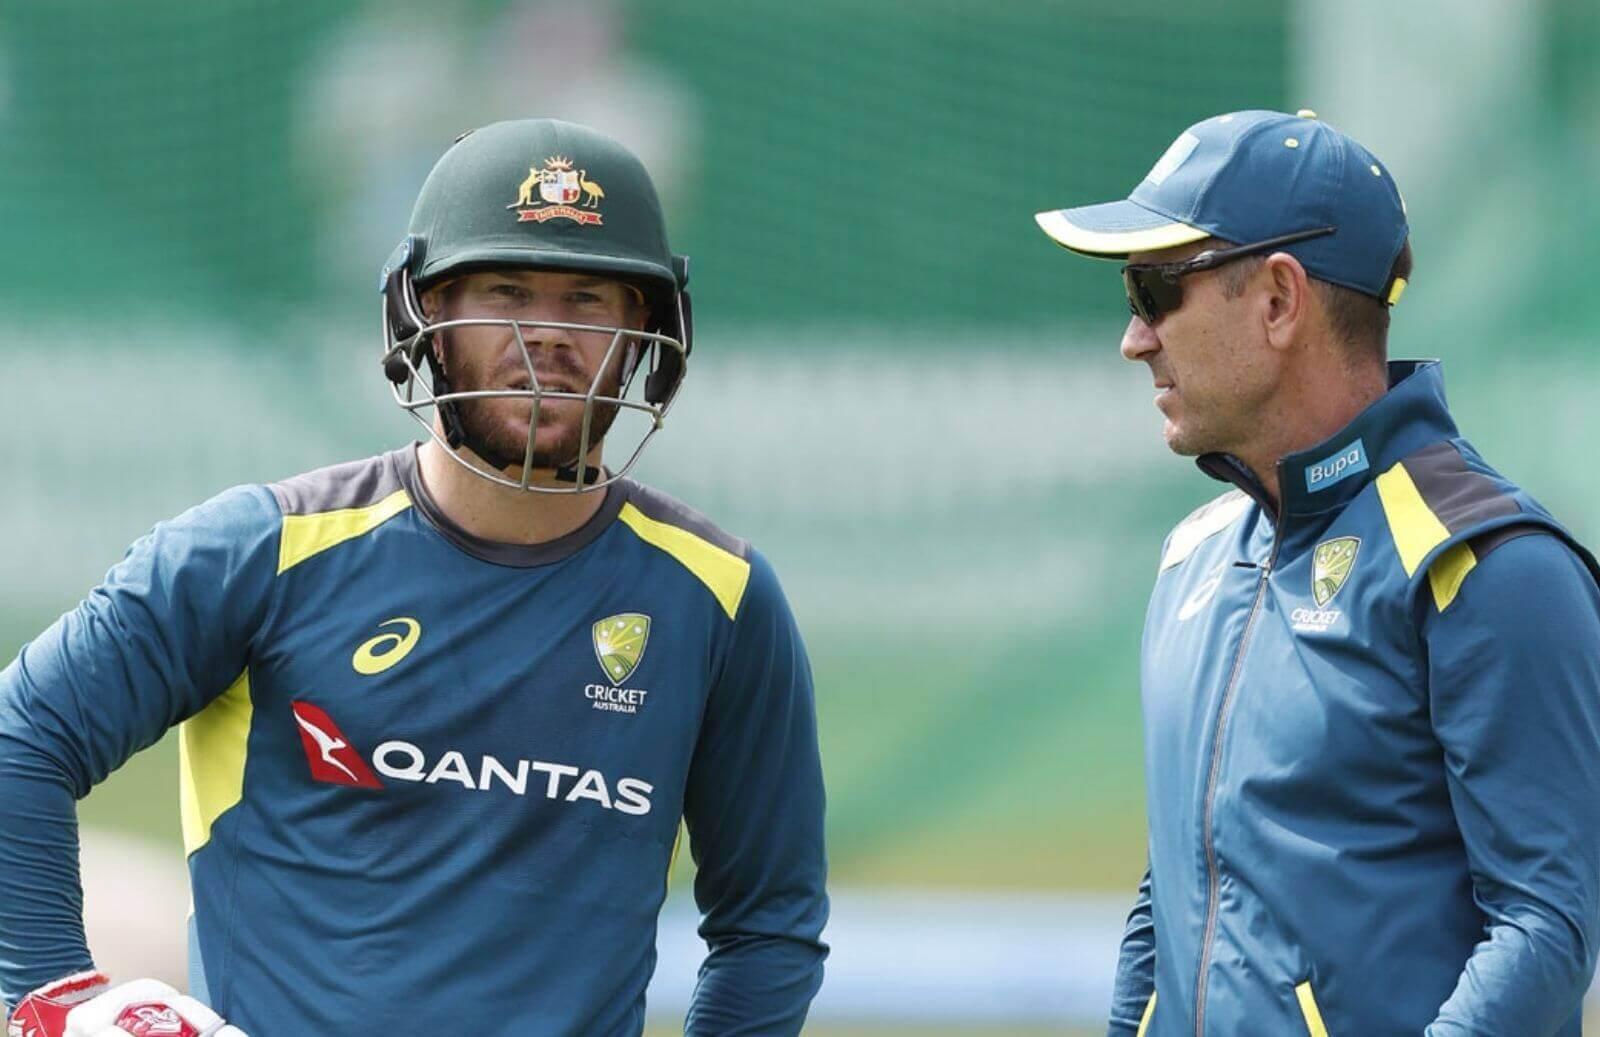 Australia Suffers Big Blow, Justin Langer Confirms David Warner Remains Doubtful For 1st Test